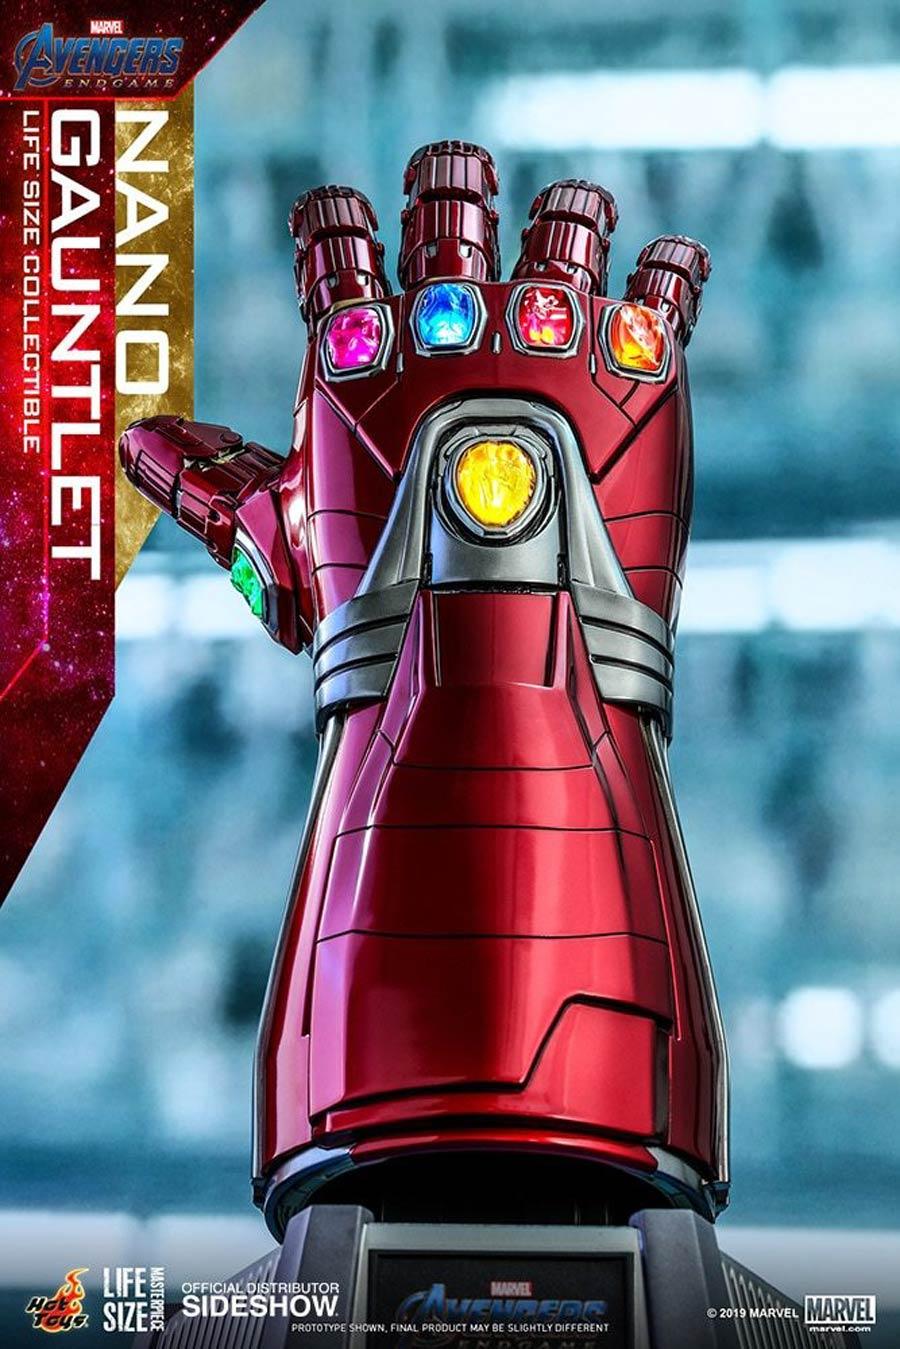 Avengers Endgame Nano Gauntlet Life-Size Replica